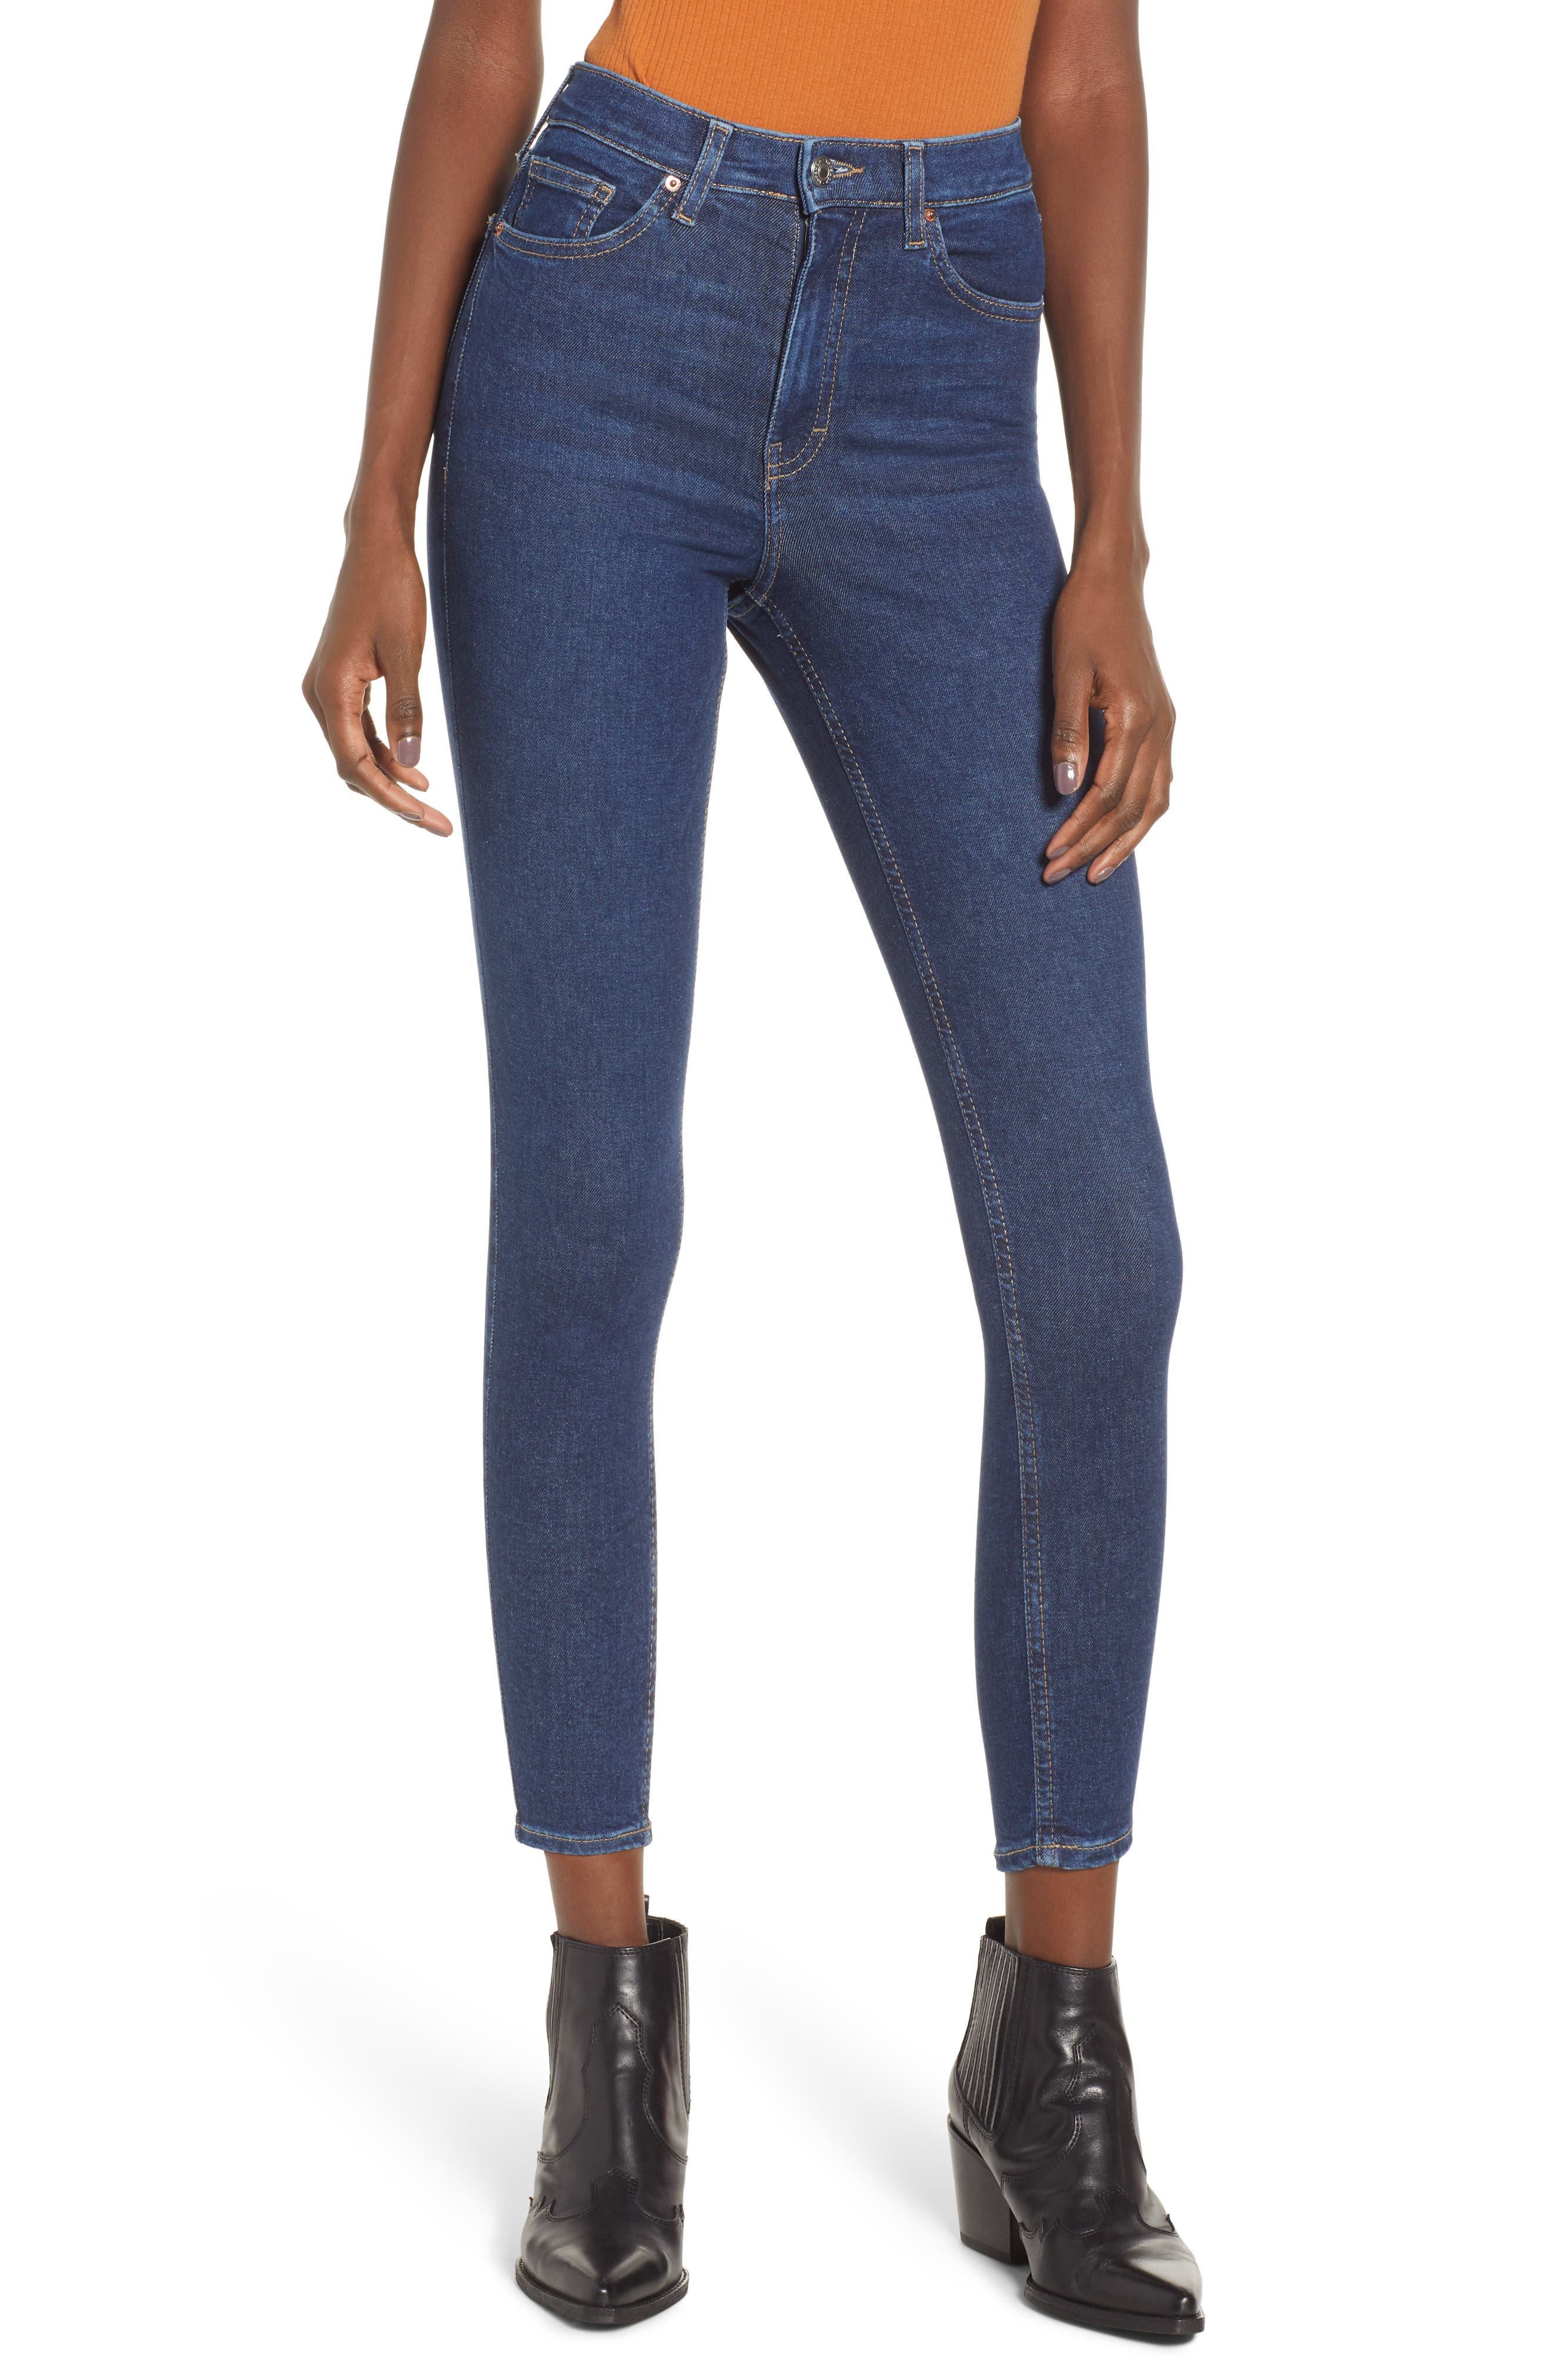 TOPSHOP, MOTO Jamie High Waist Skinny Jeans, Main thumbnail 1, color, INDIGO